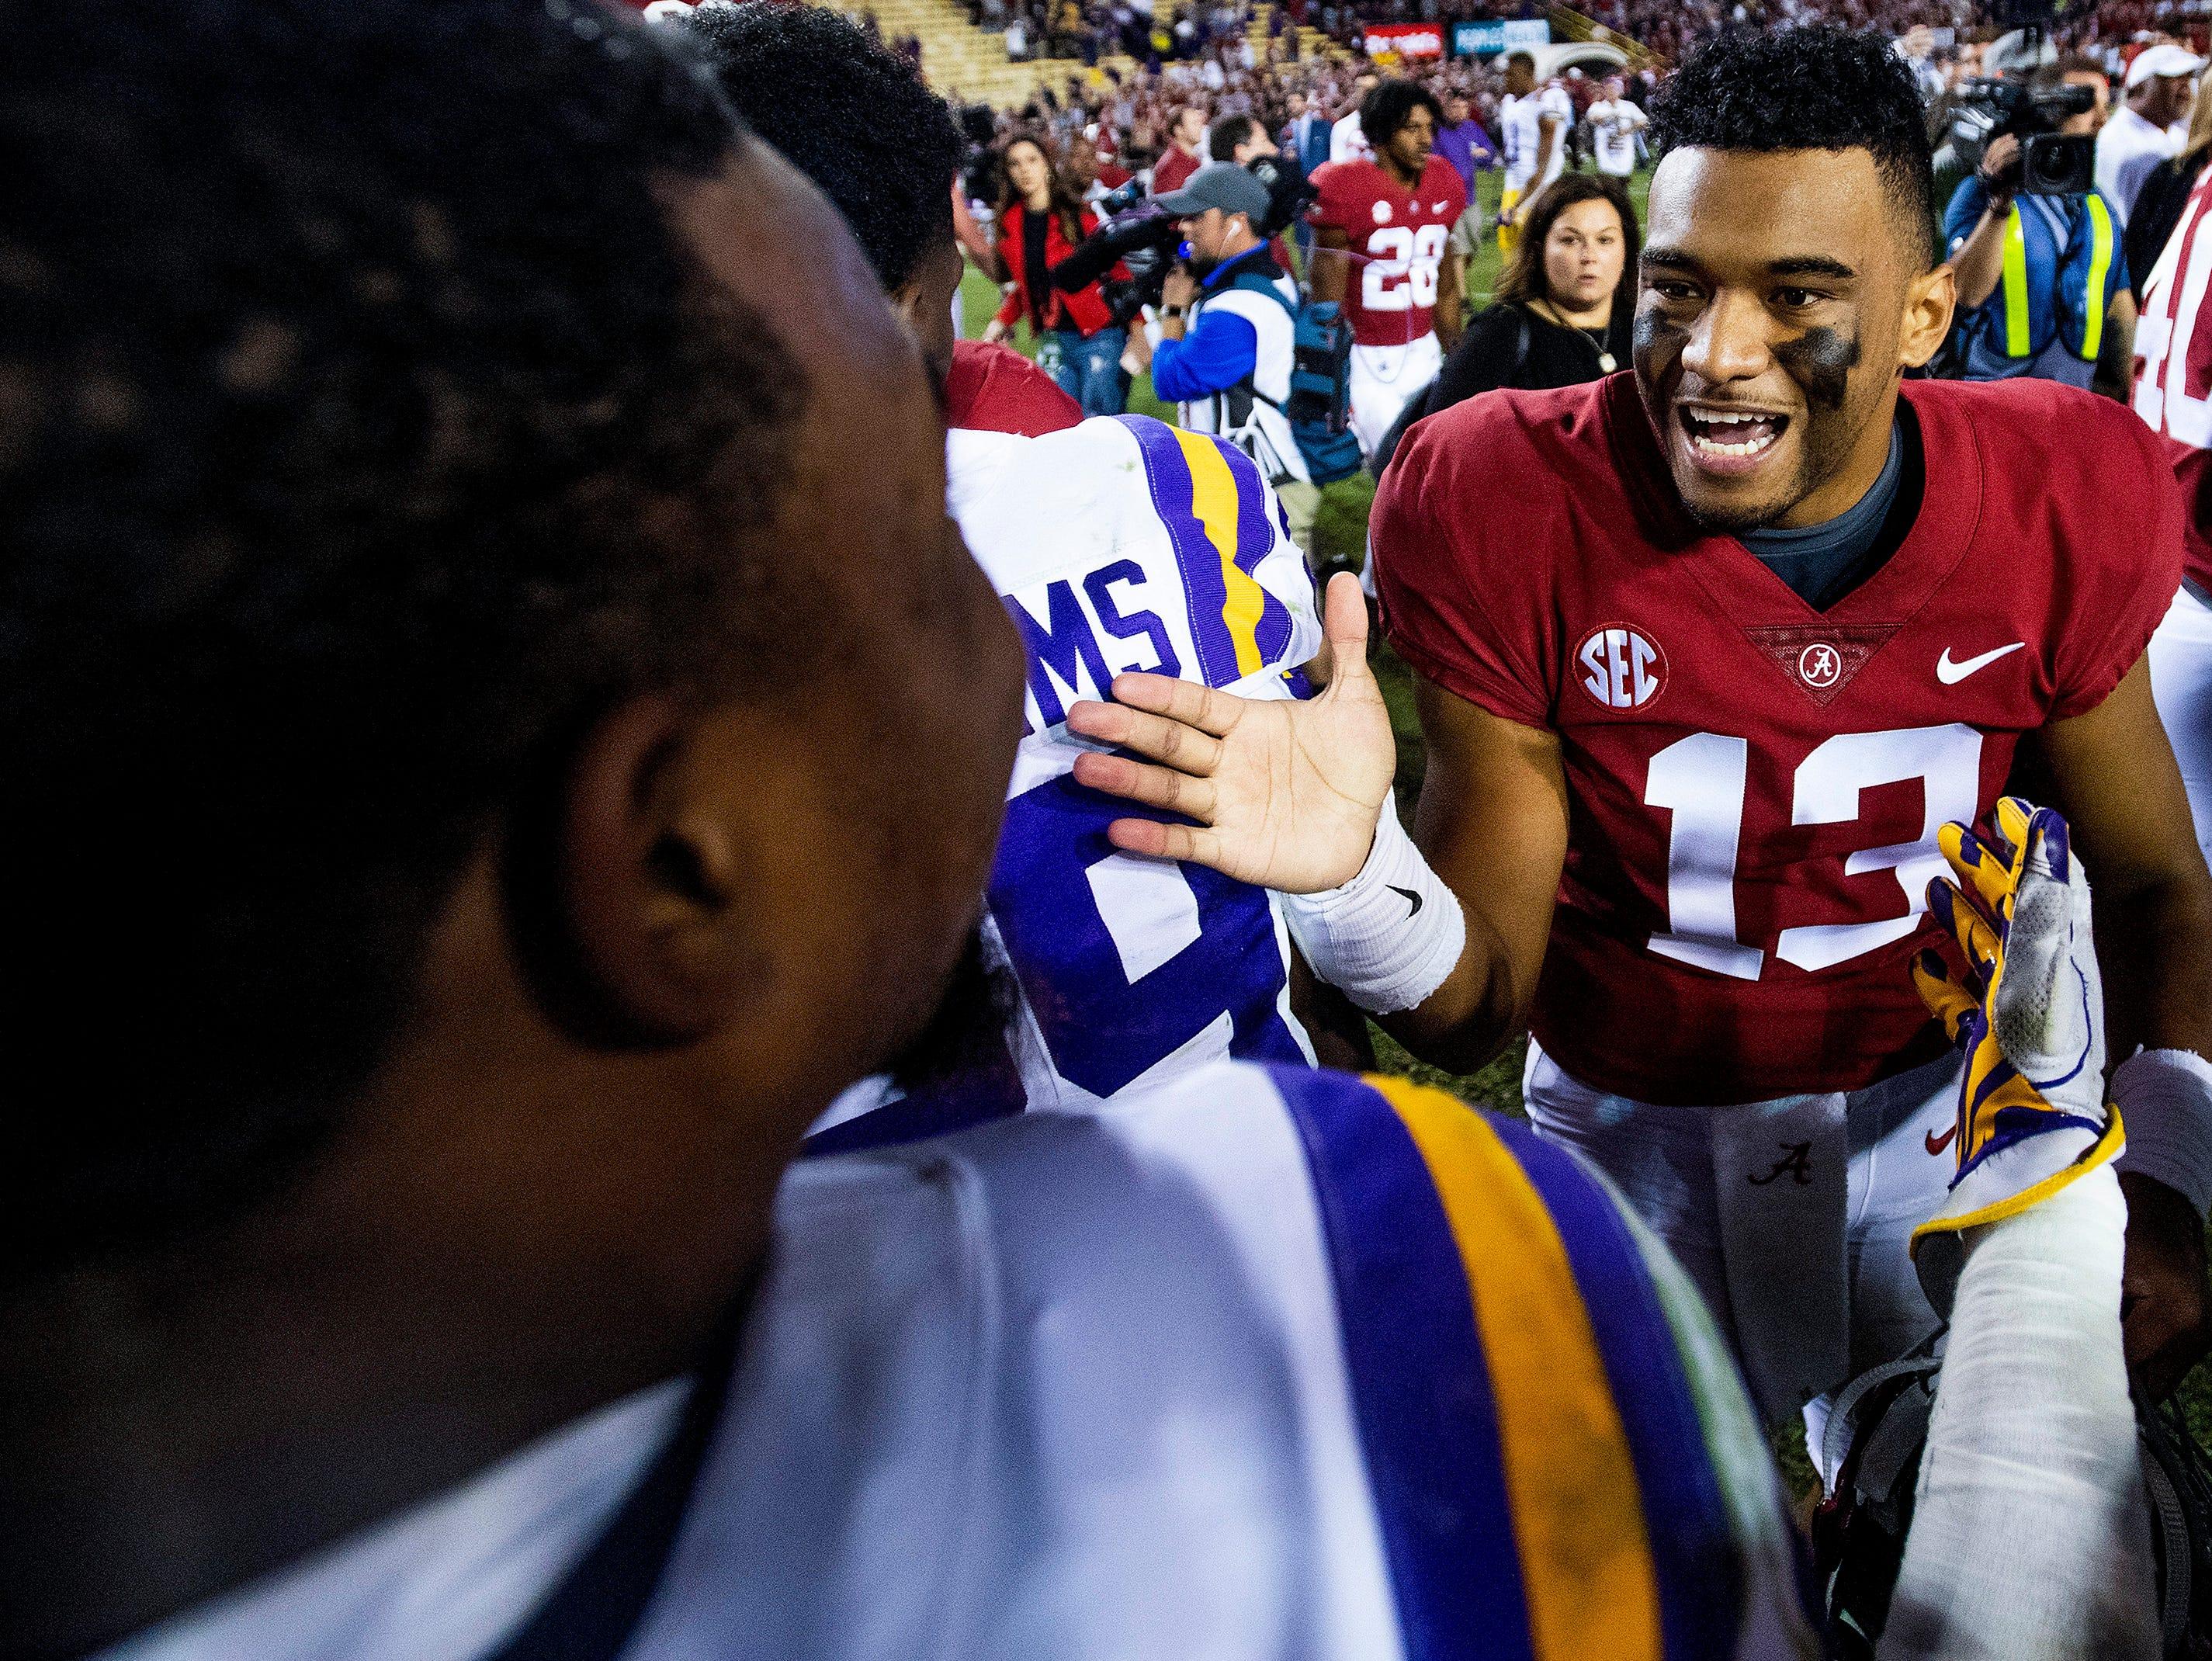 Alabama quarterback Tua Tagovailoa (13) greets Louisiana State University outside linebacker Michael Divinity, Jr., (45) after defeating LSU at Tiger Stadium in Baton Rouge, La., on Saturday November 3, 2018.